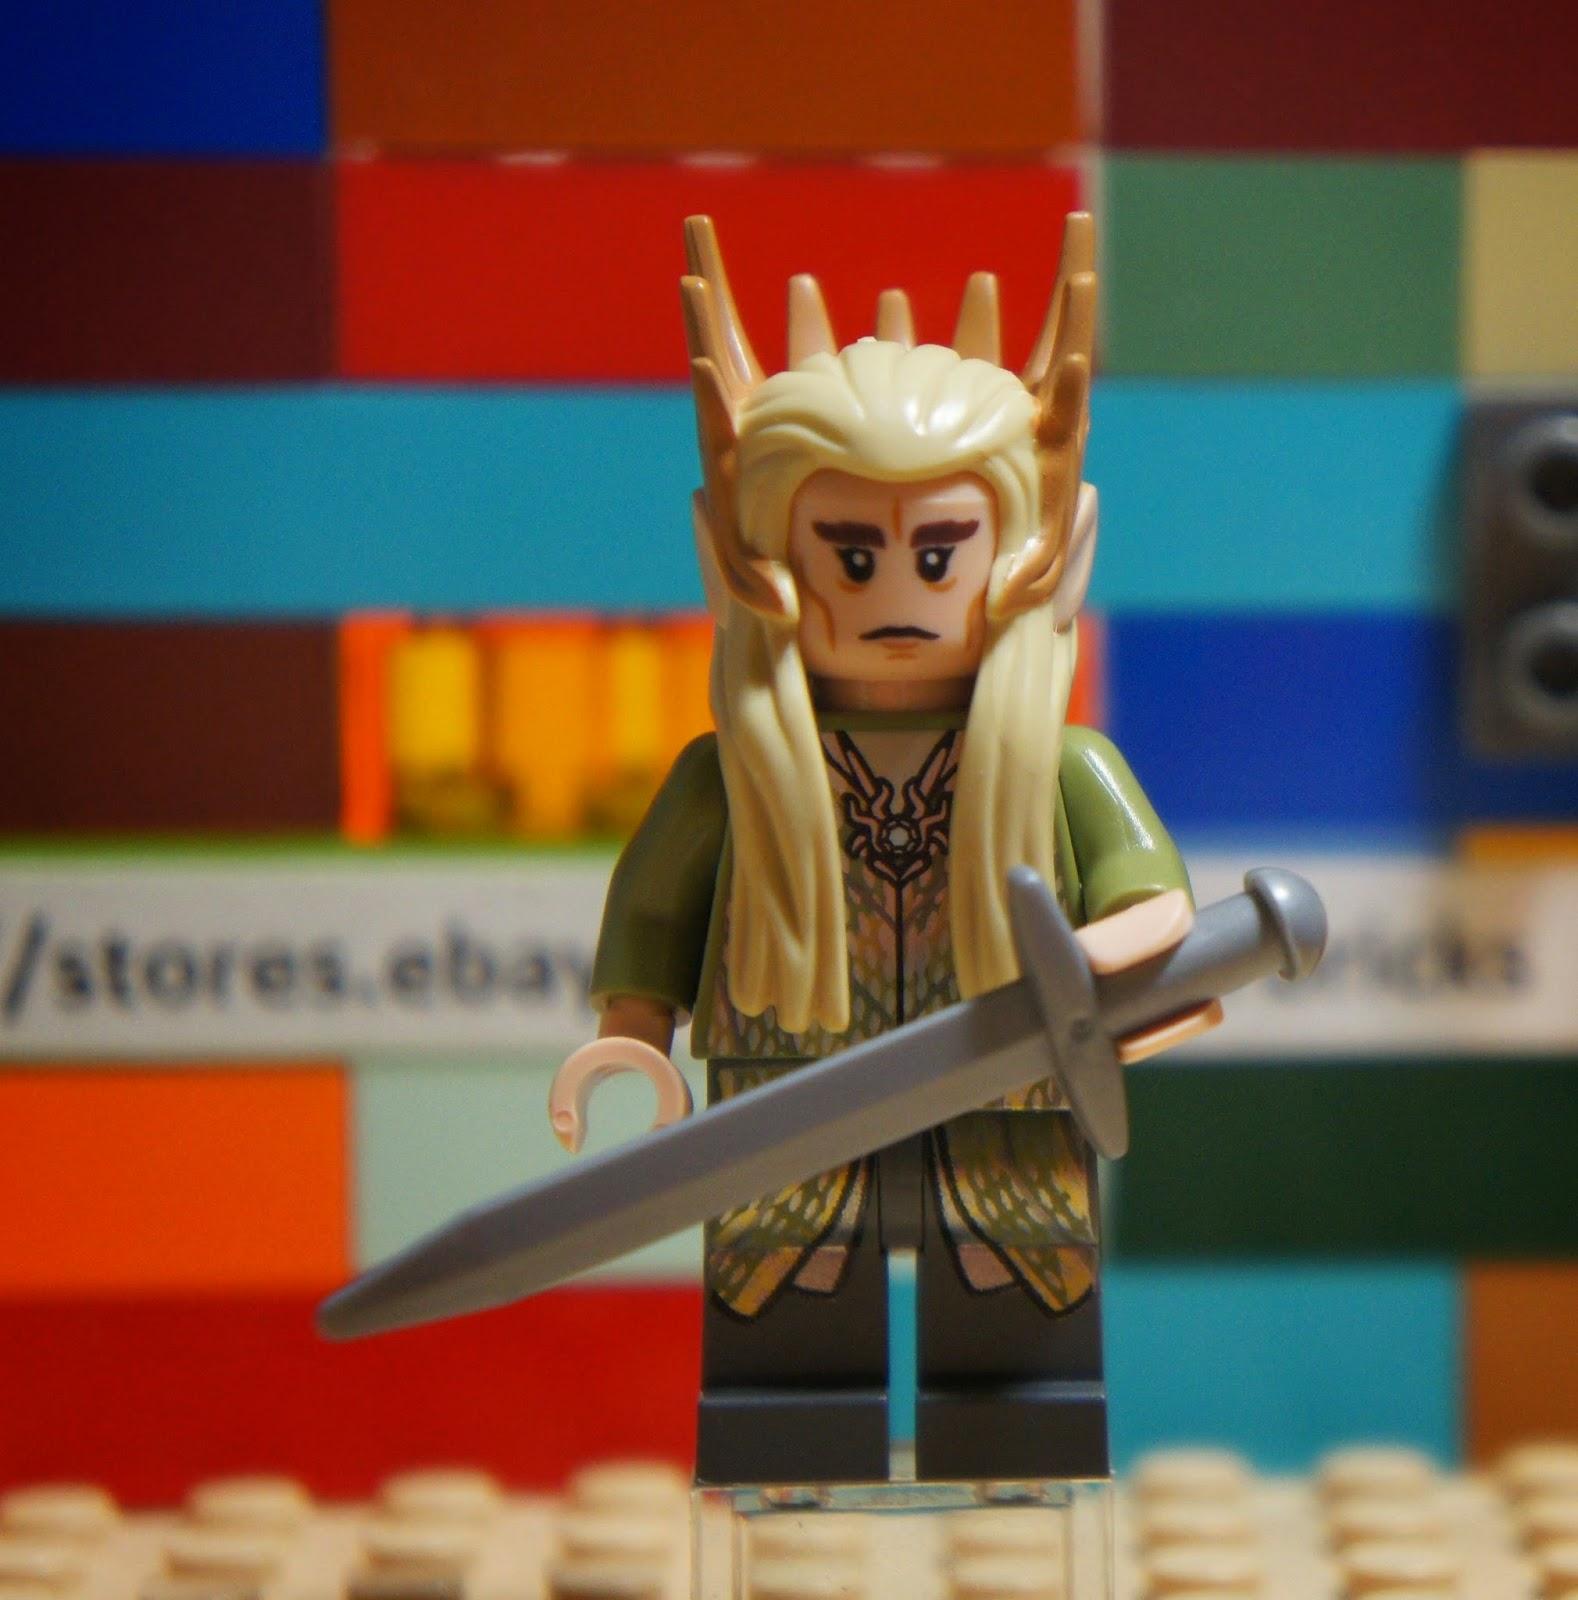 Minifigures The Hobbit Thranduil lor079 Lego